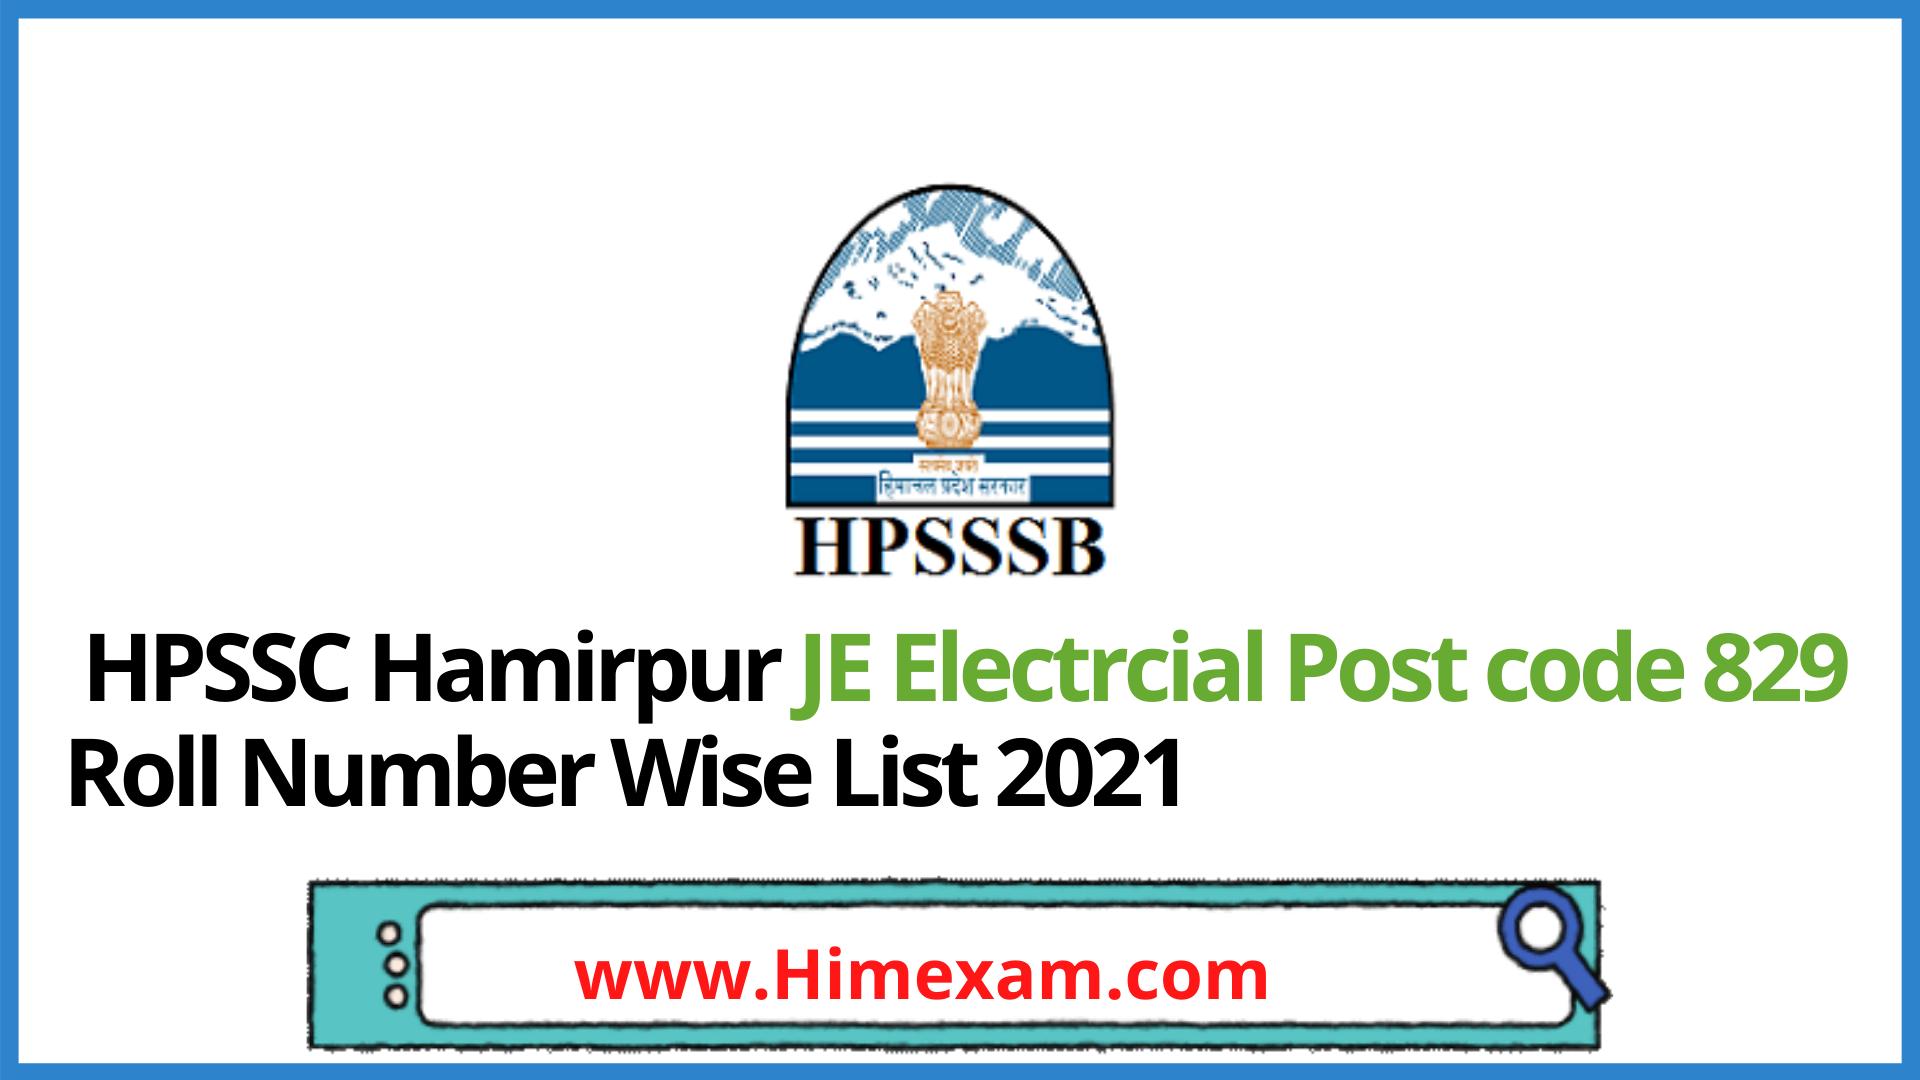 HPSSC Hamirpur JE Electrcial Post code 829 Roll Number Wise List 2021